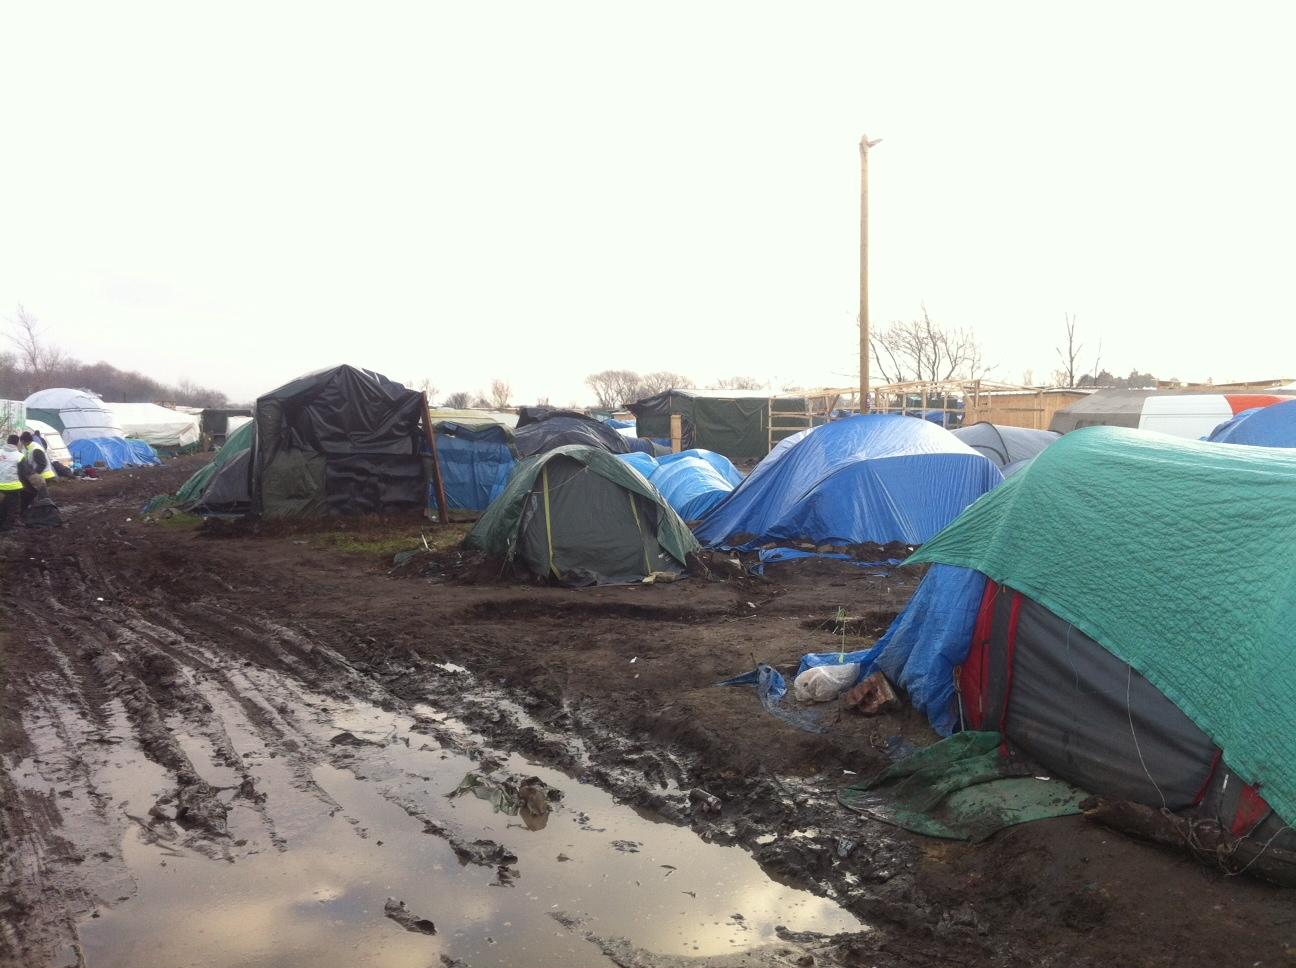 La giungla di Calais